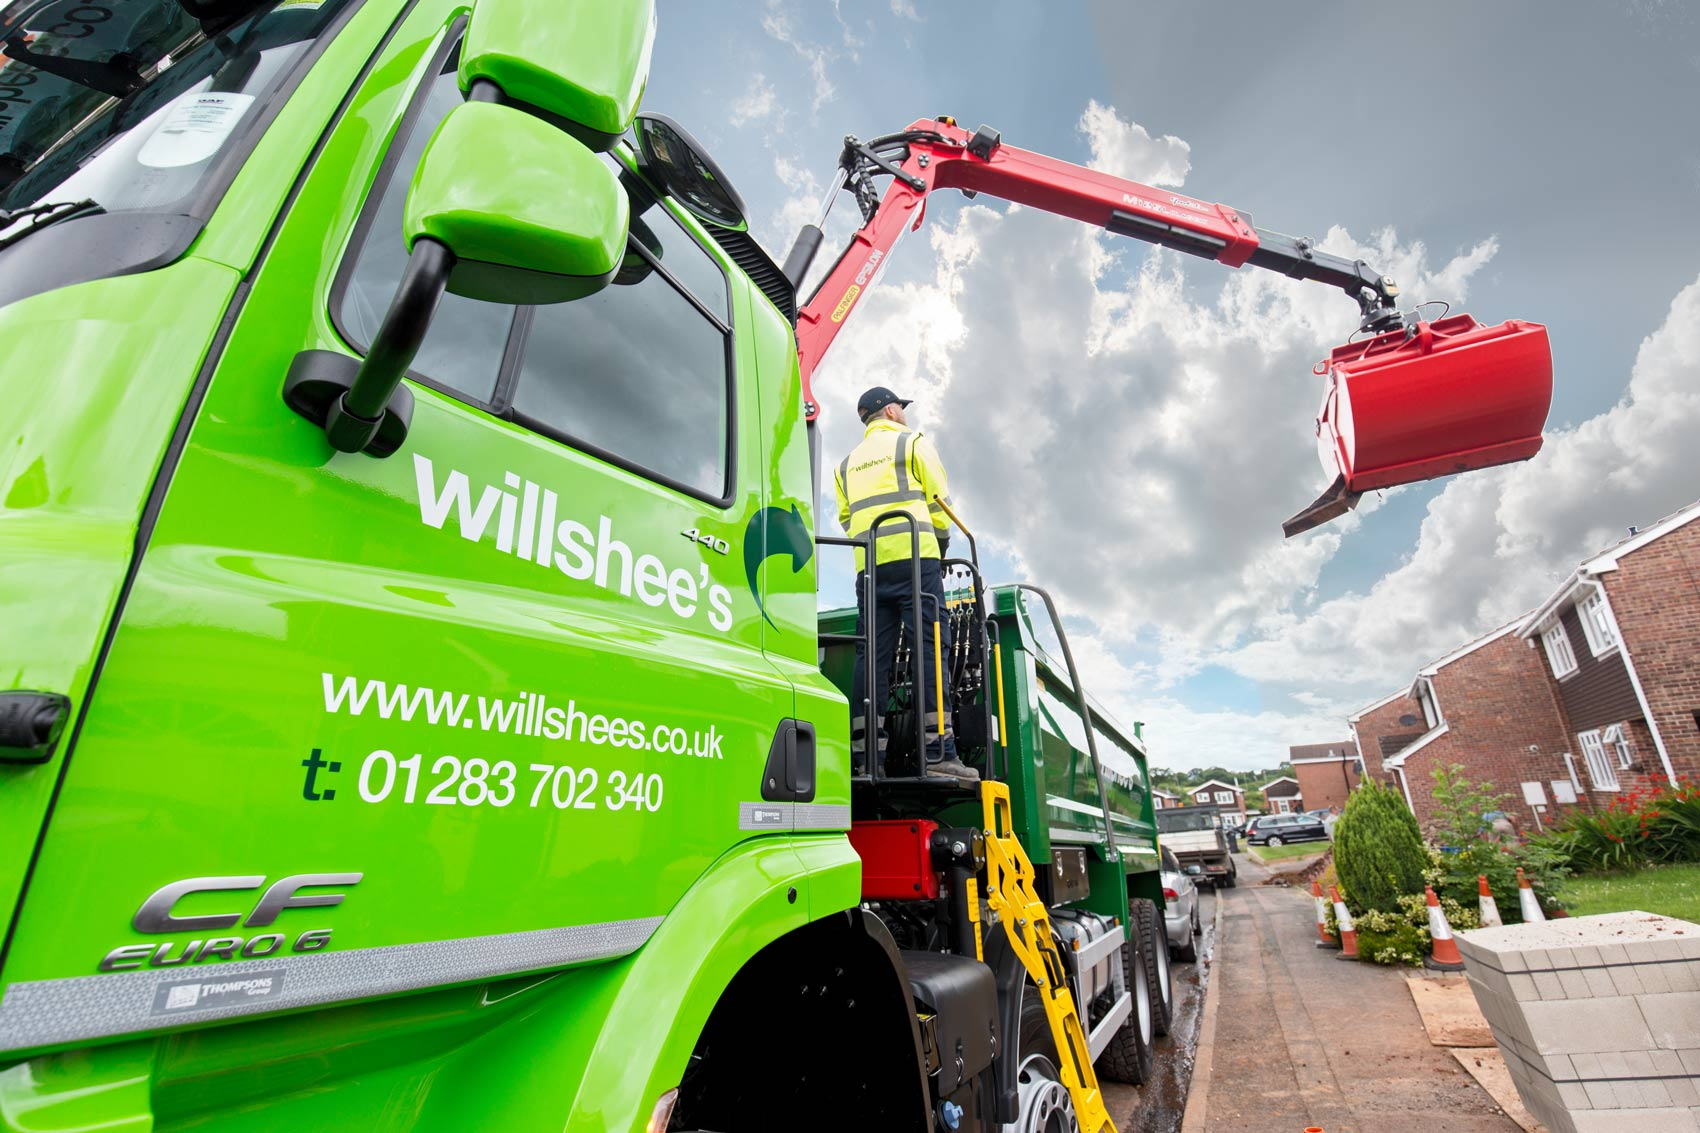 Willshees-waste-managment-grab-lorry